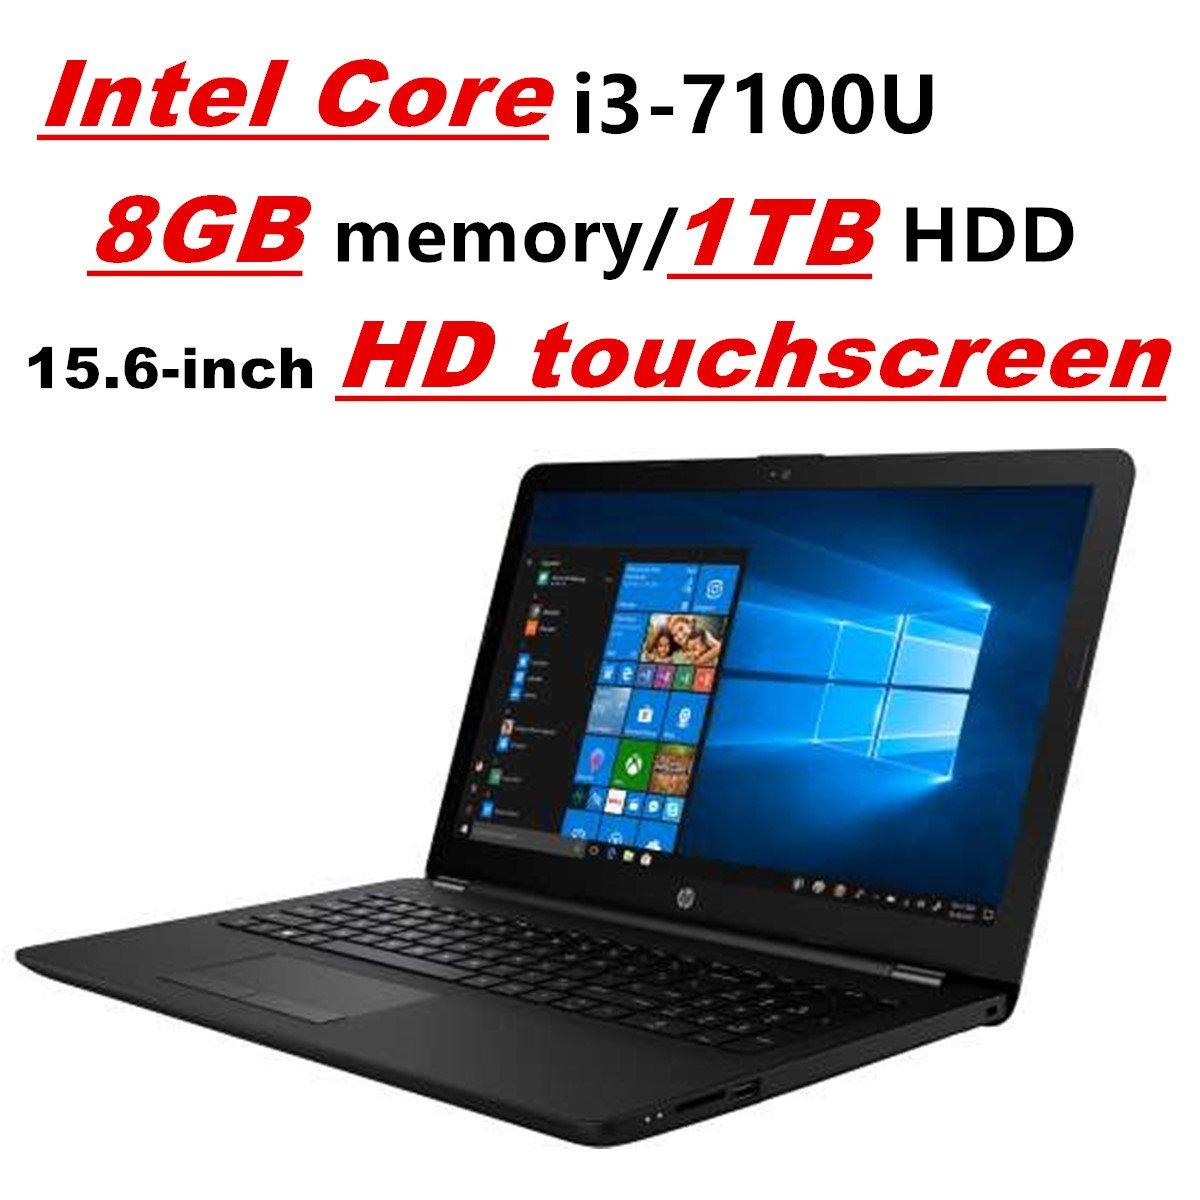 HP Pavilion Laptop PC Notebook, Intel Core i3-7100U, 8GB DDR4, 1TB HDD,  15 6